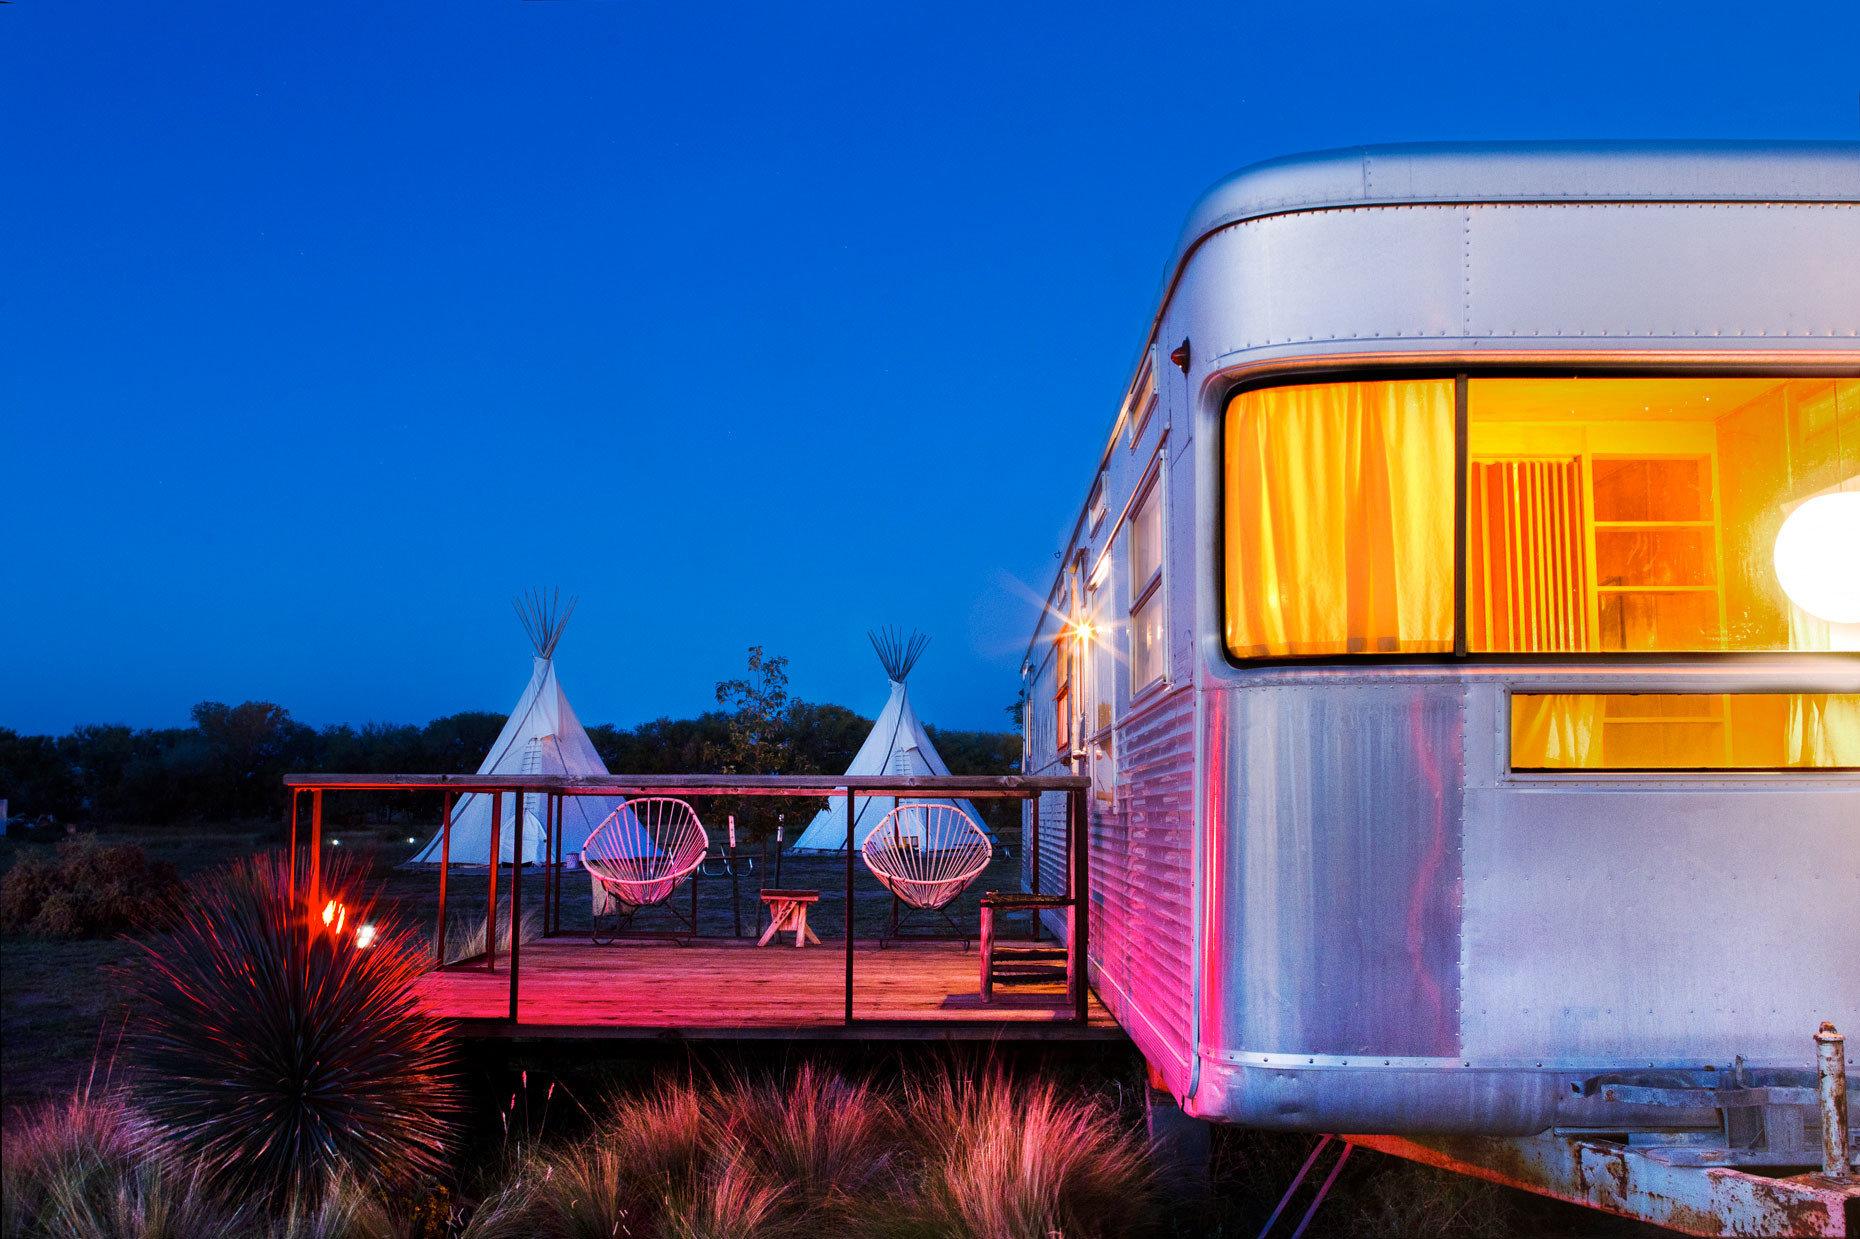 Glamping Luxury Travel Outdoors + Adventure sky outdoor transport vehicle night evening light